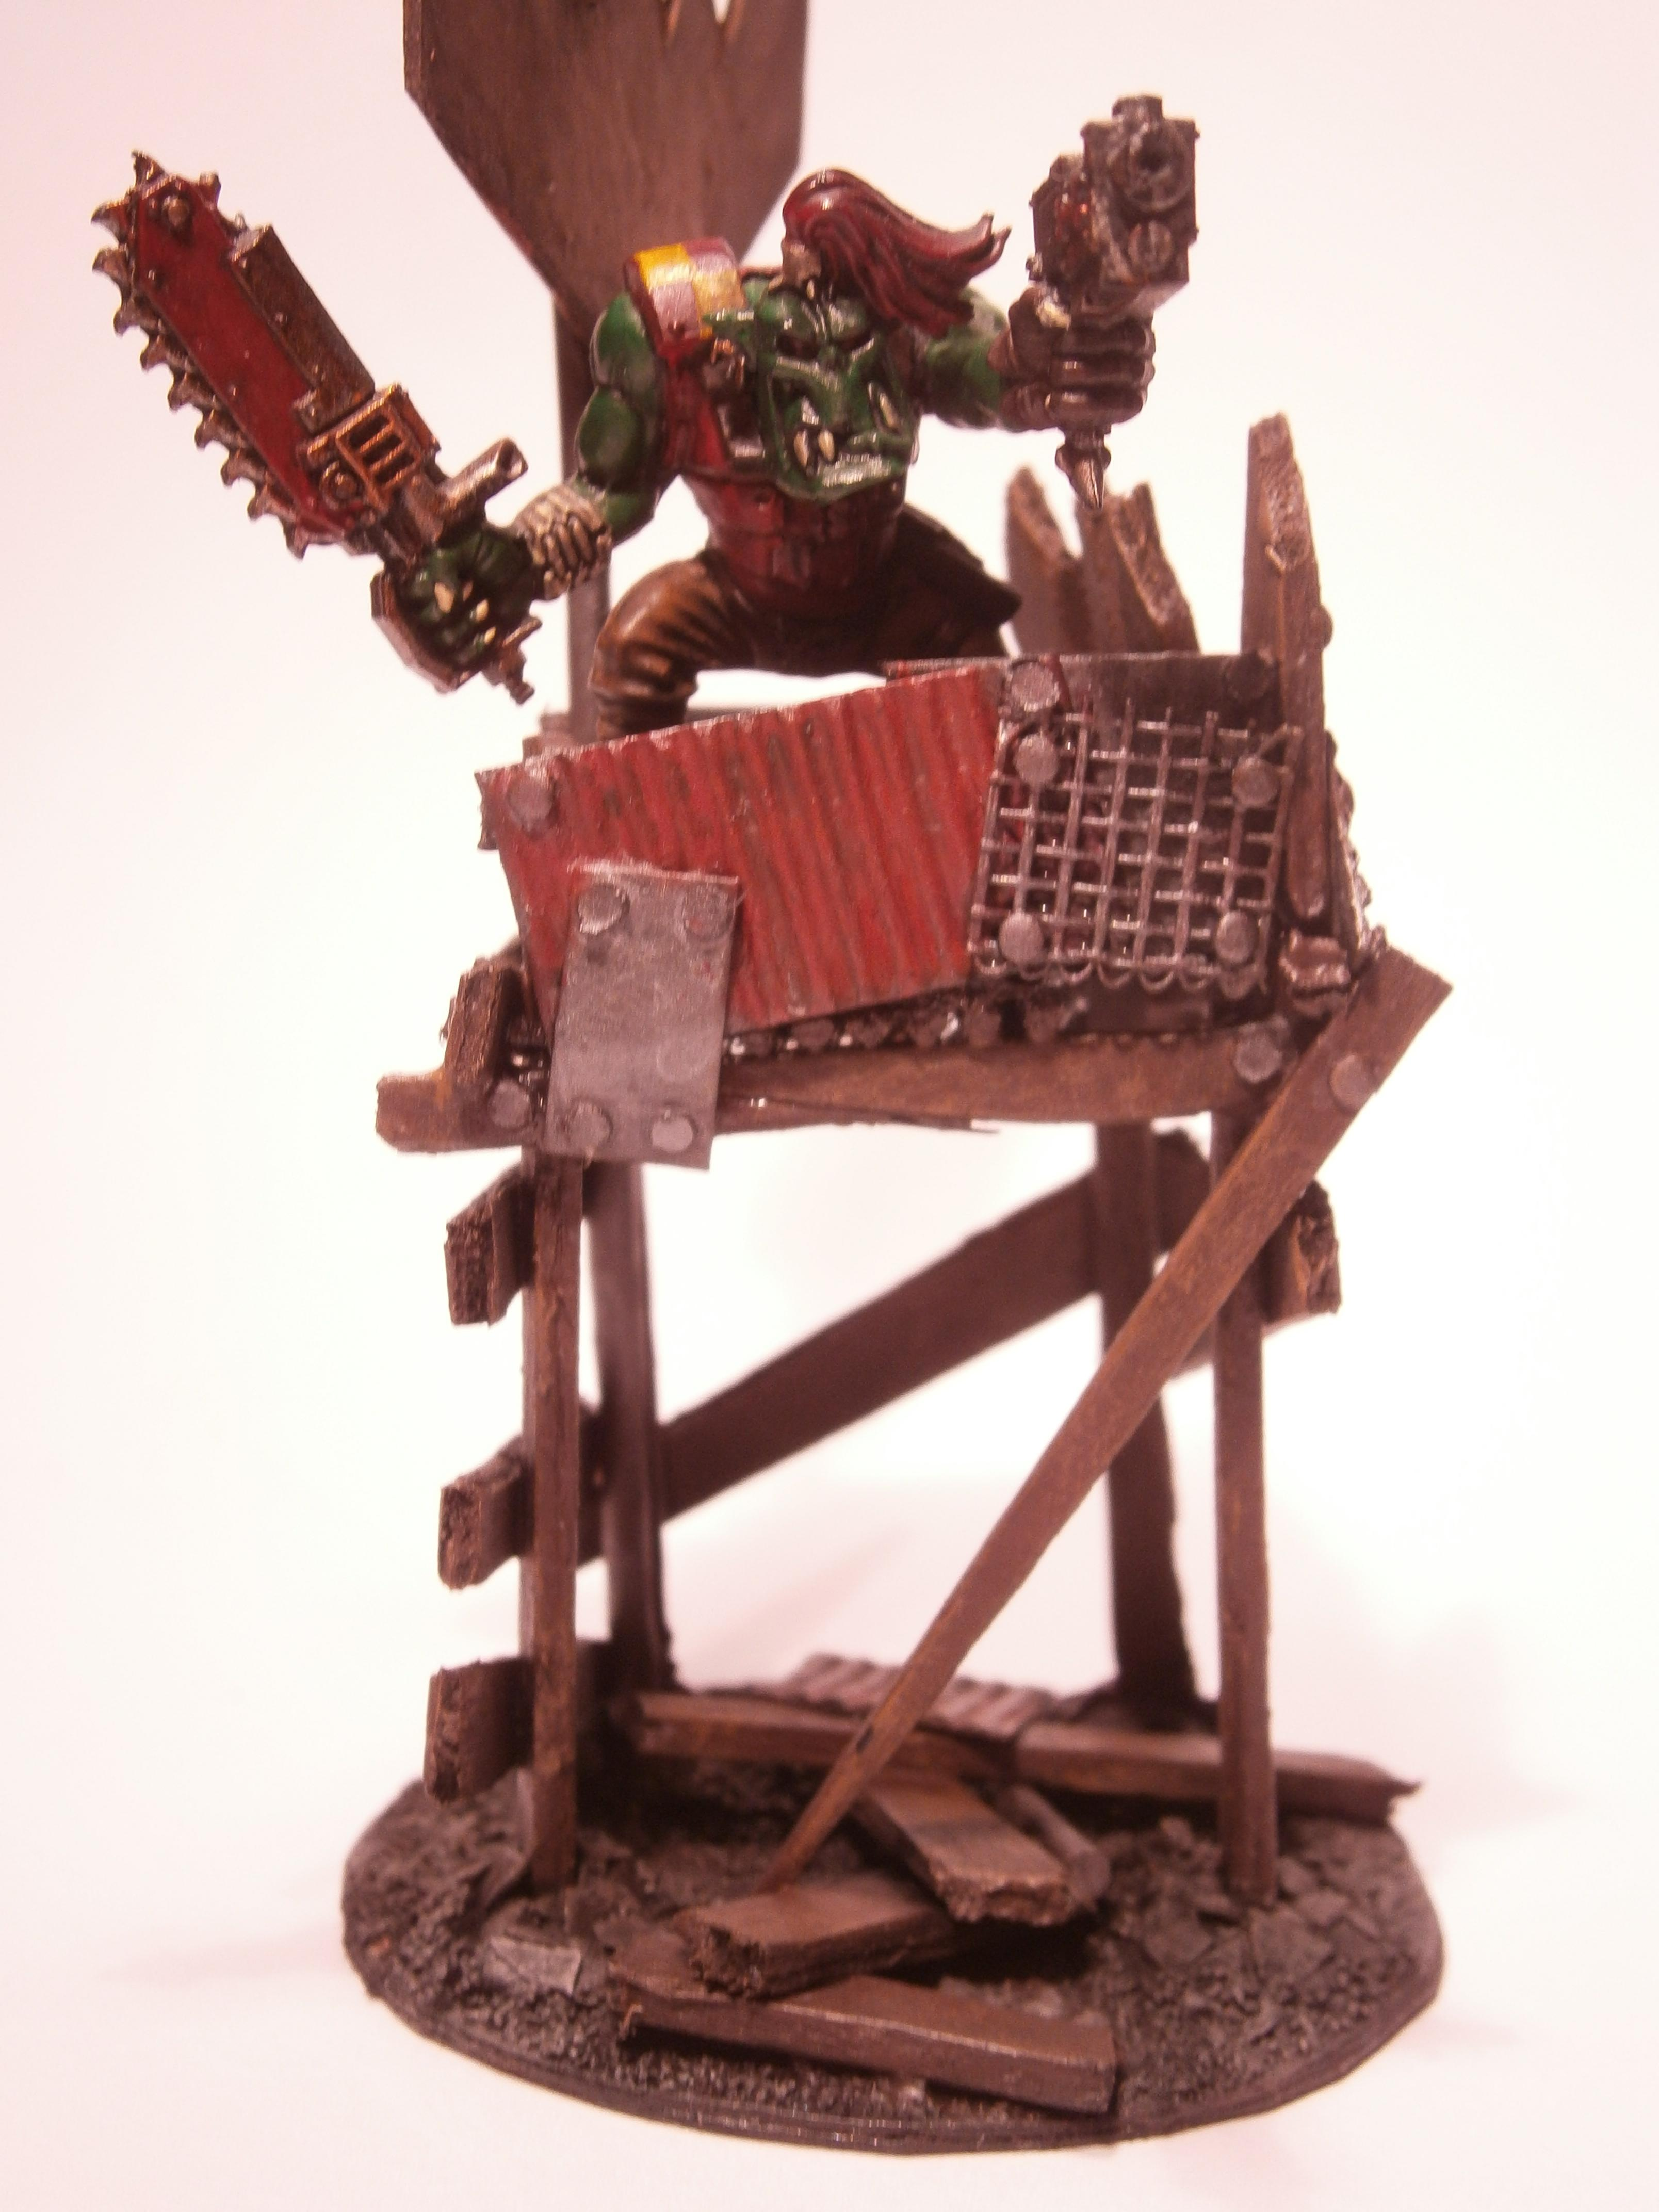 Banner, Buildings, Orks, Orky, Scratch Build, Terrain, Waaaagh, Warhammer 40,000, Watch Tower, Wooden